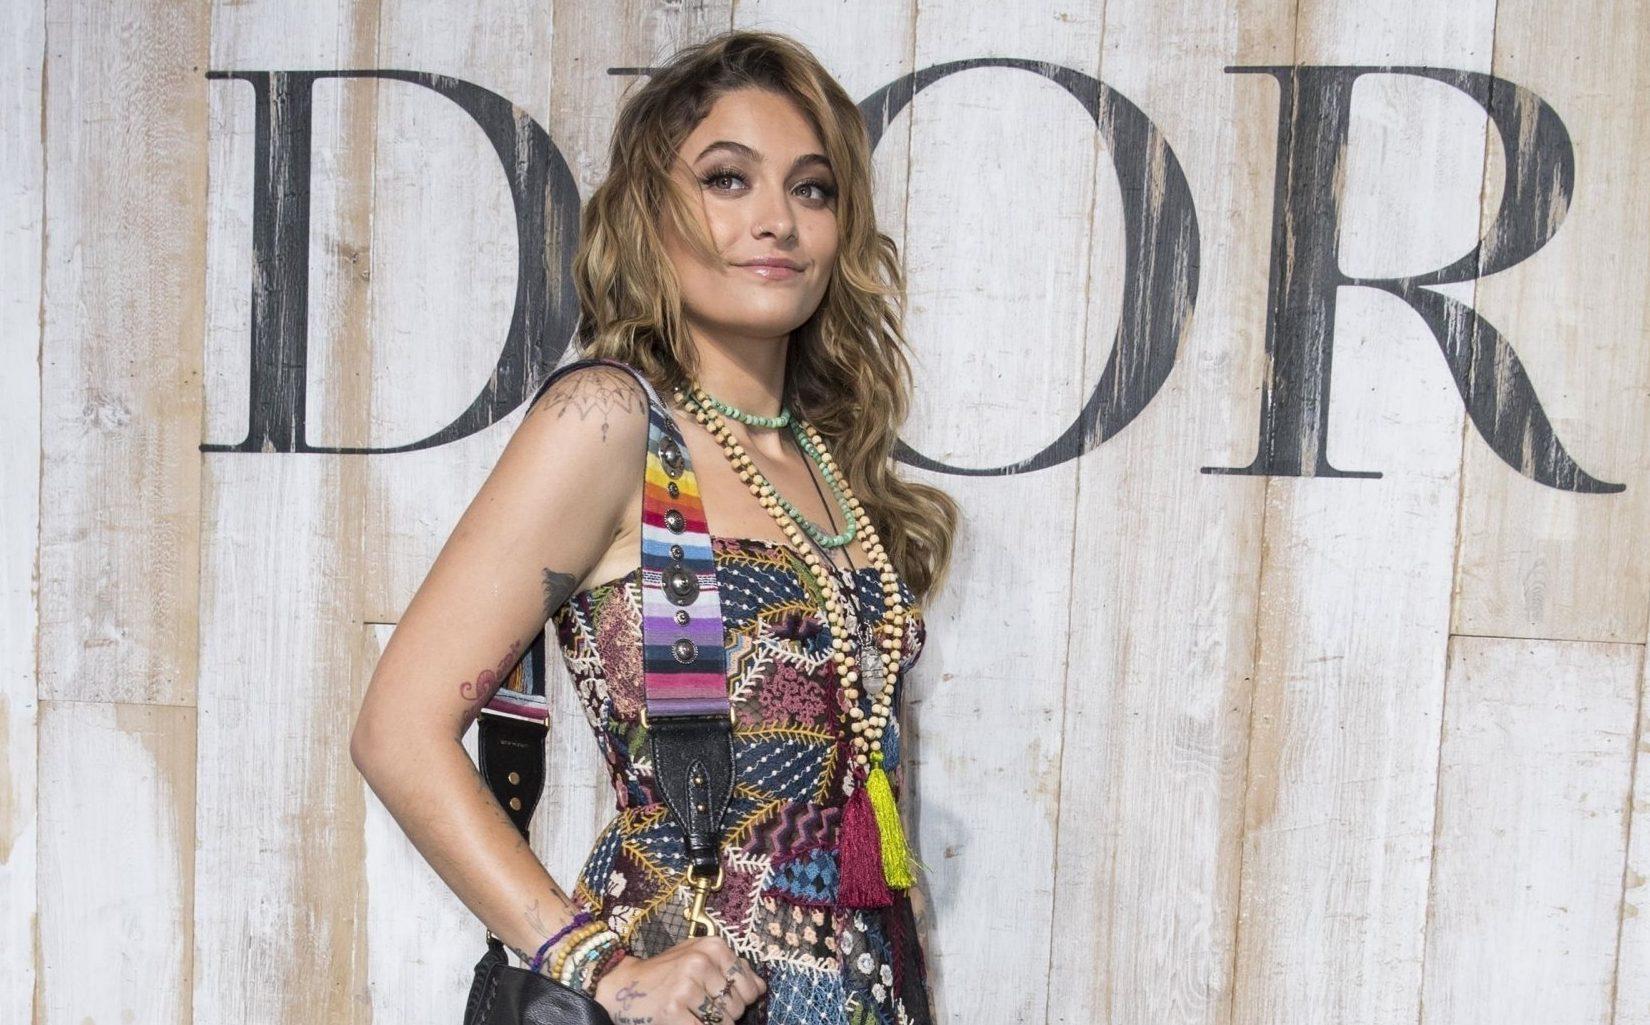 Paris Jackson 'granted restraining order against alleged stalker'